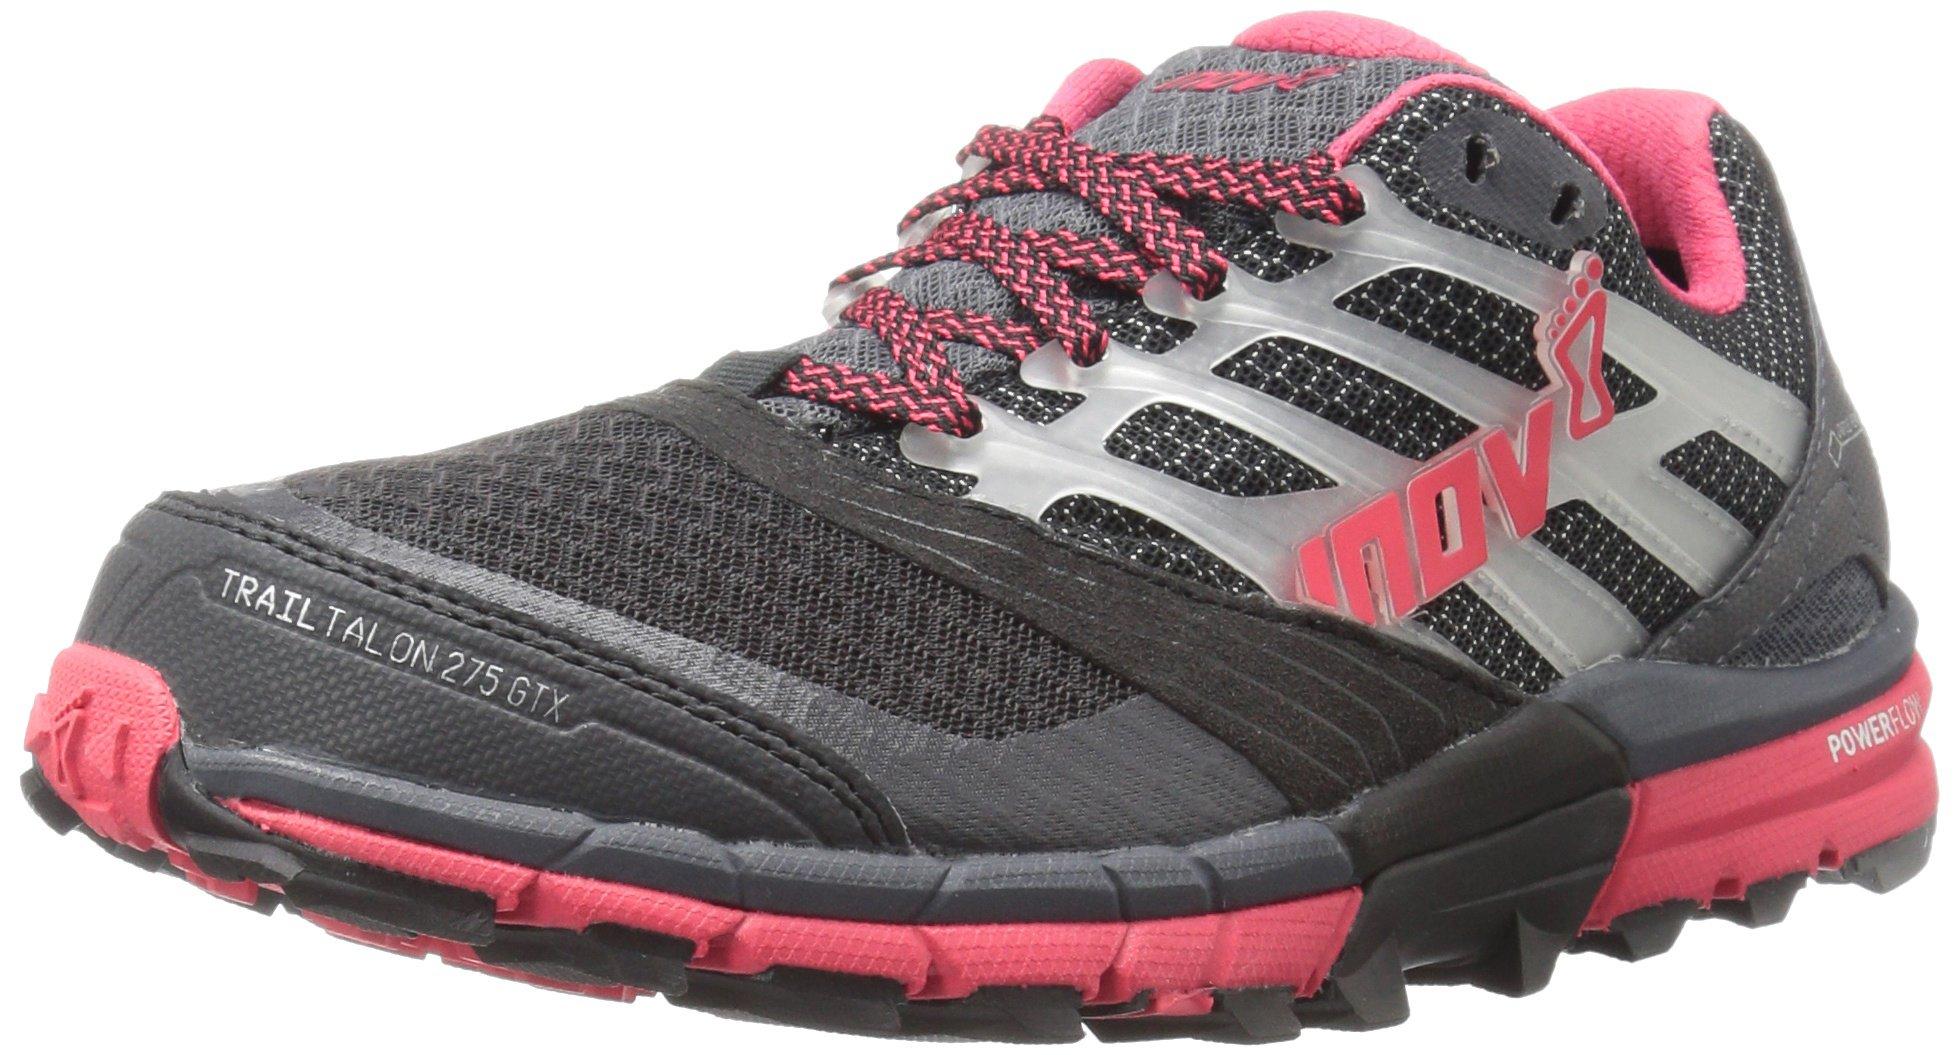 Inov-8 Trailtalon™ 275 Gtx-U Trail Runner, Grey/Pink, 7.5 M US